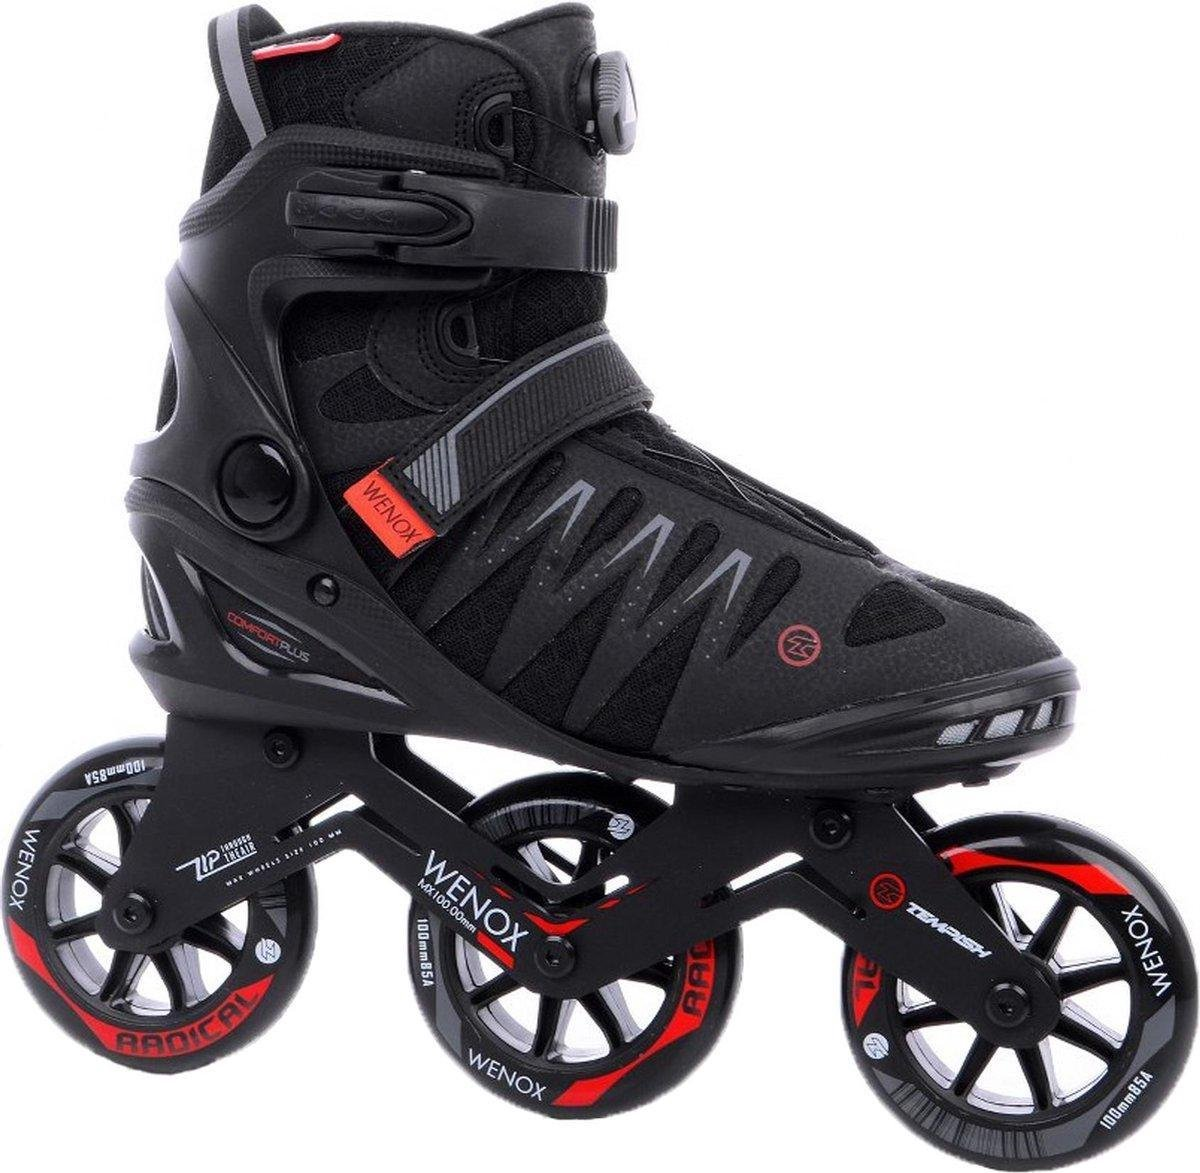 Tempish - Skeelers - Wenox - Top 100 - Zwart/Rood - Maat 40 - Heren - Skates